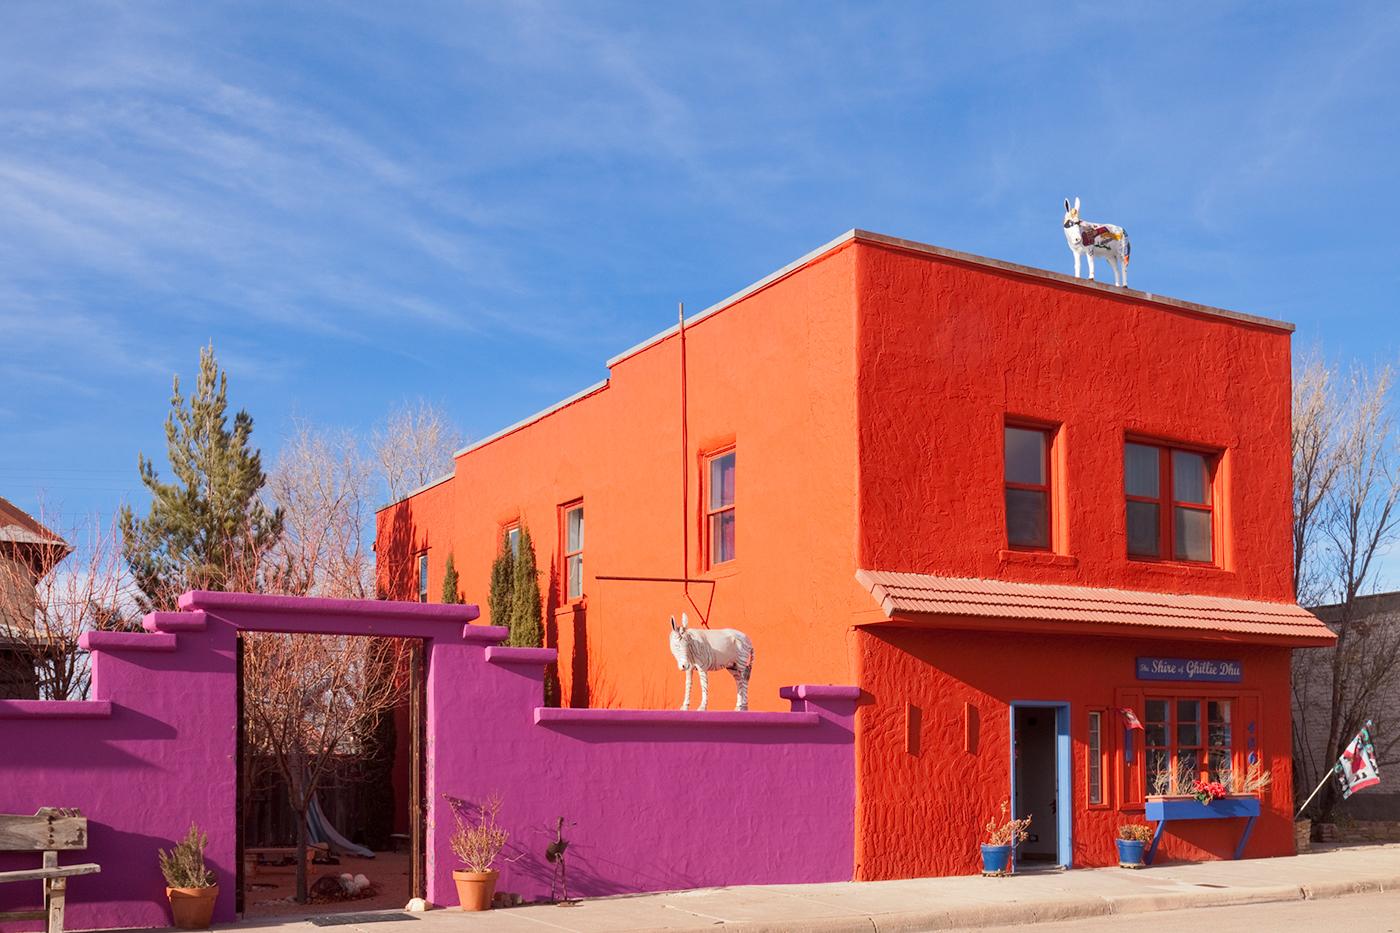 Carrizozo, Route 54, New Mexico